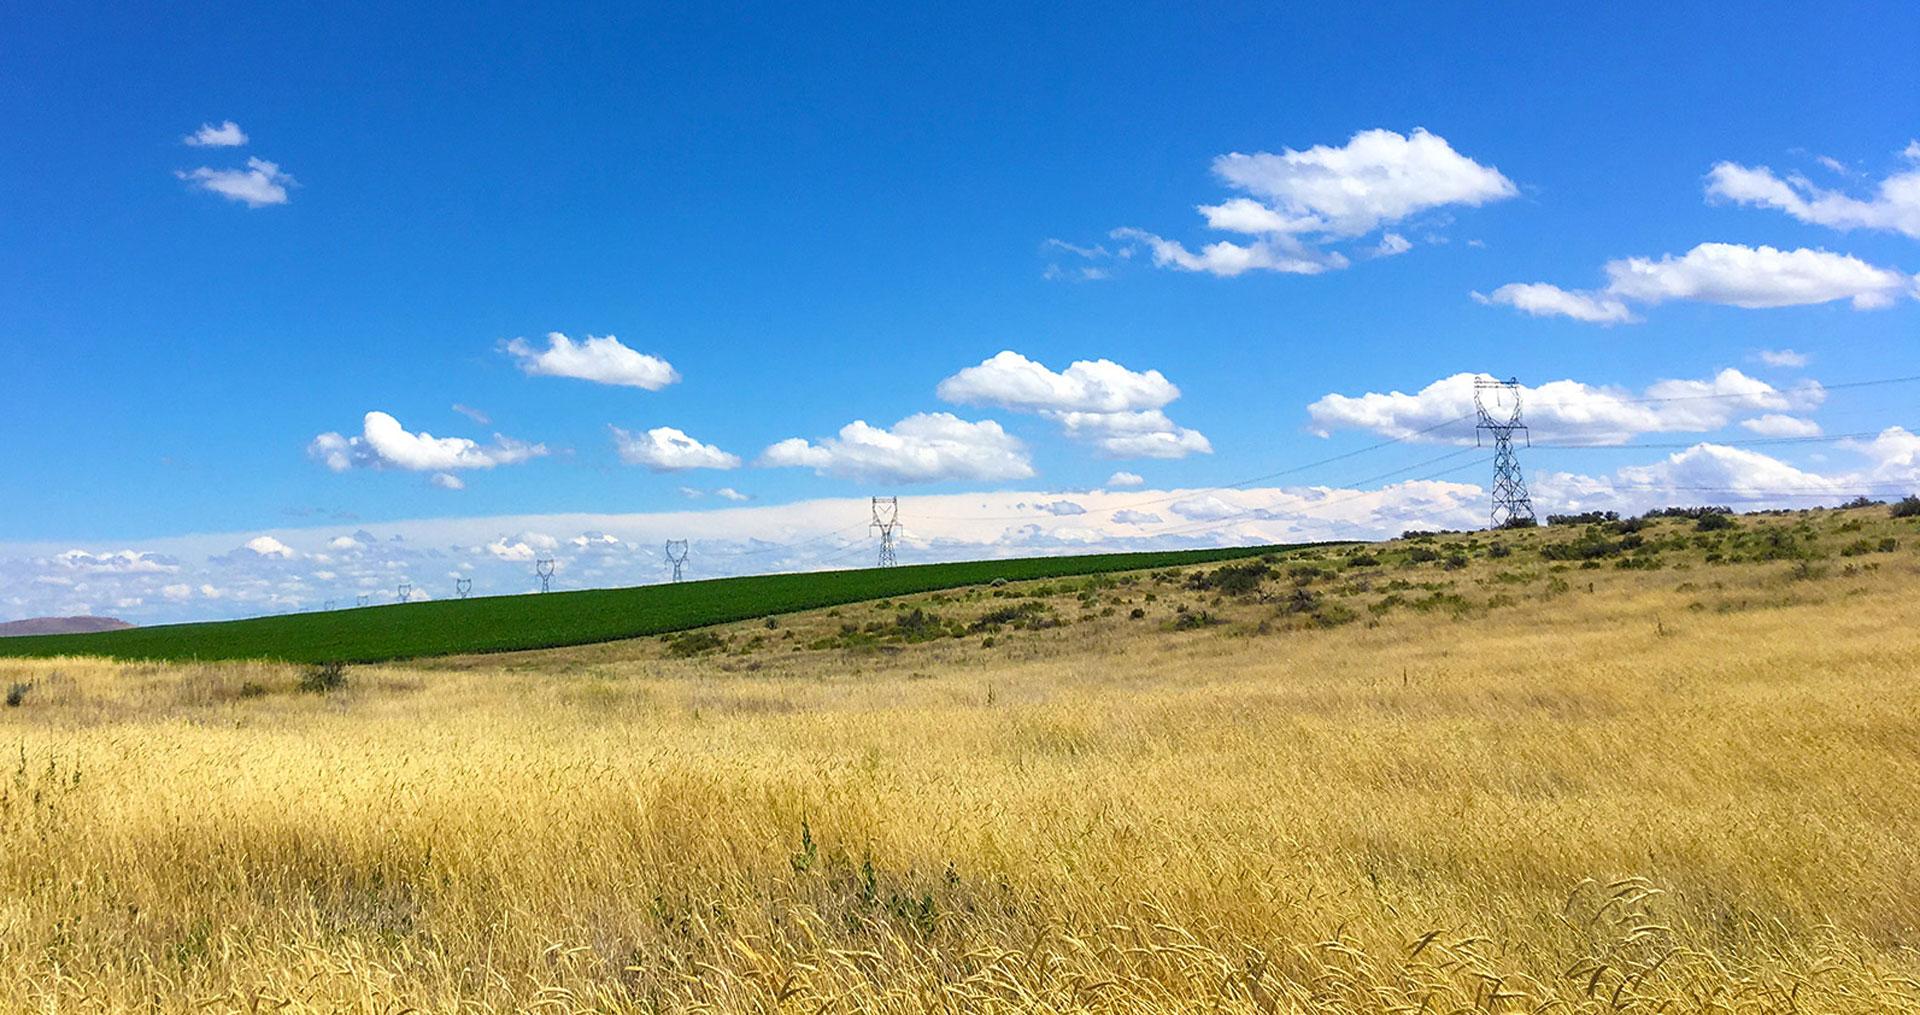 Photo of transmission lines across a landscape